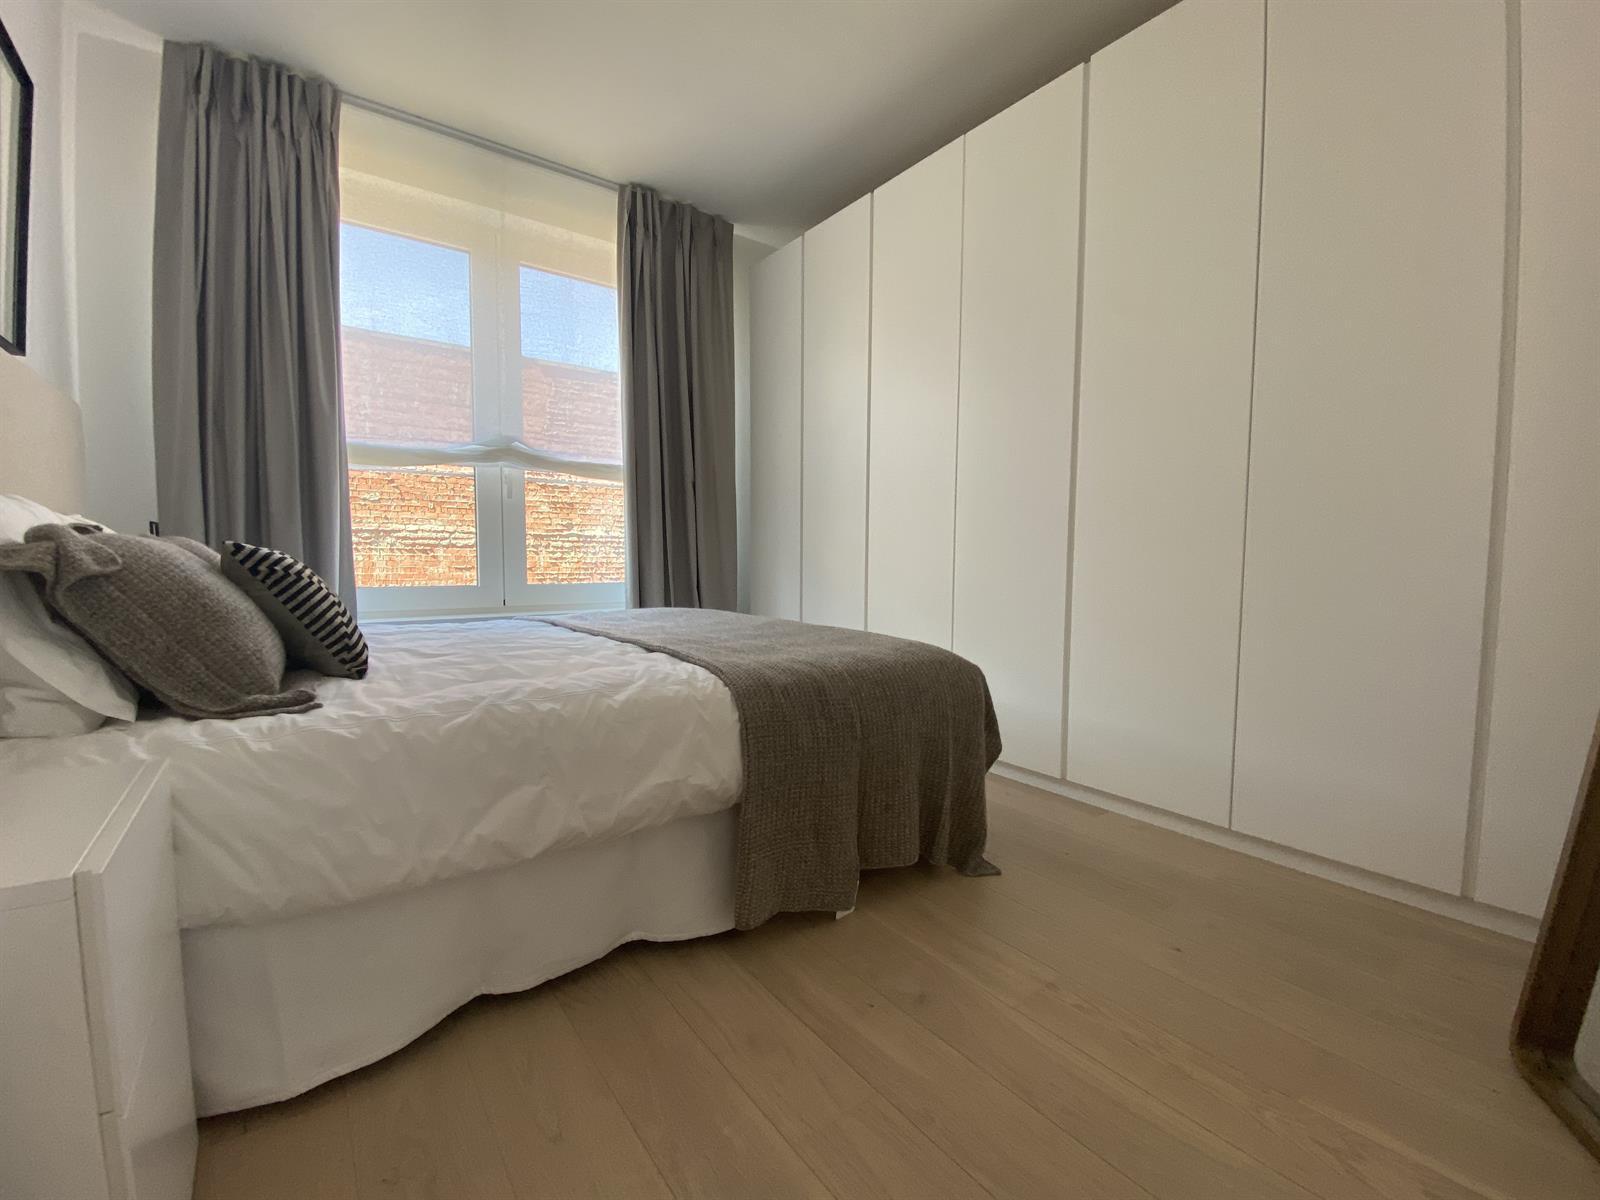 Appartement - Woluwe-Saint-Lambert - #4455478-8